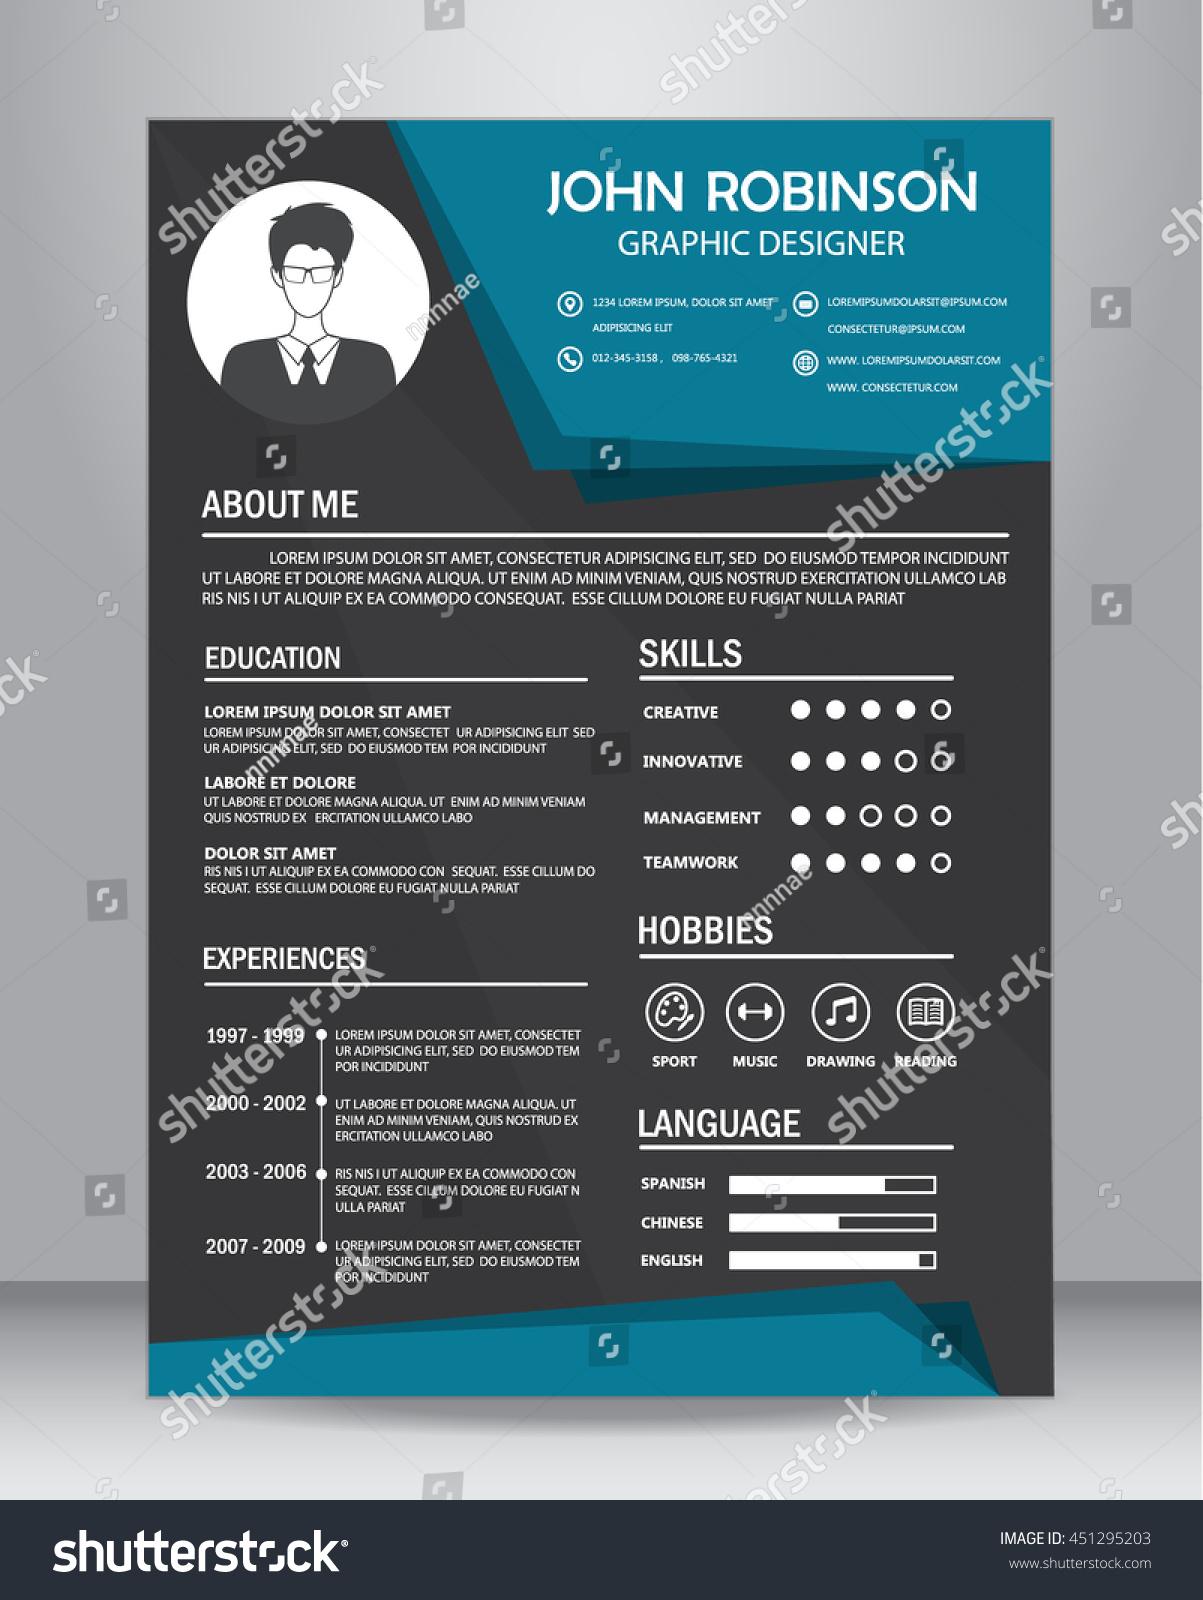 job resume cv design template layout のベクター画像素材